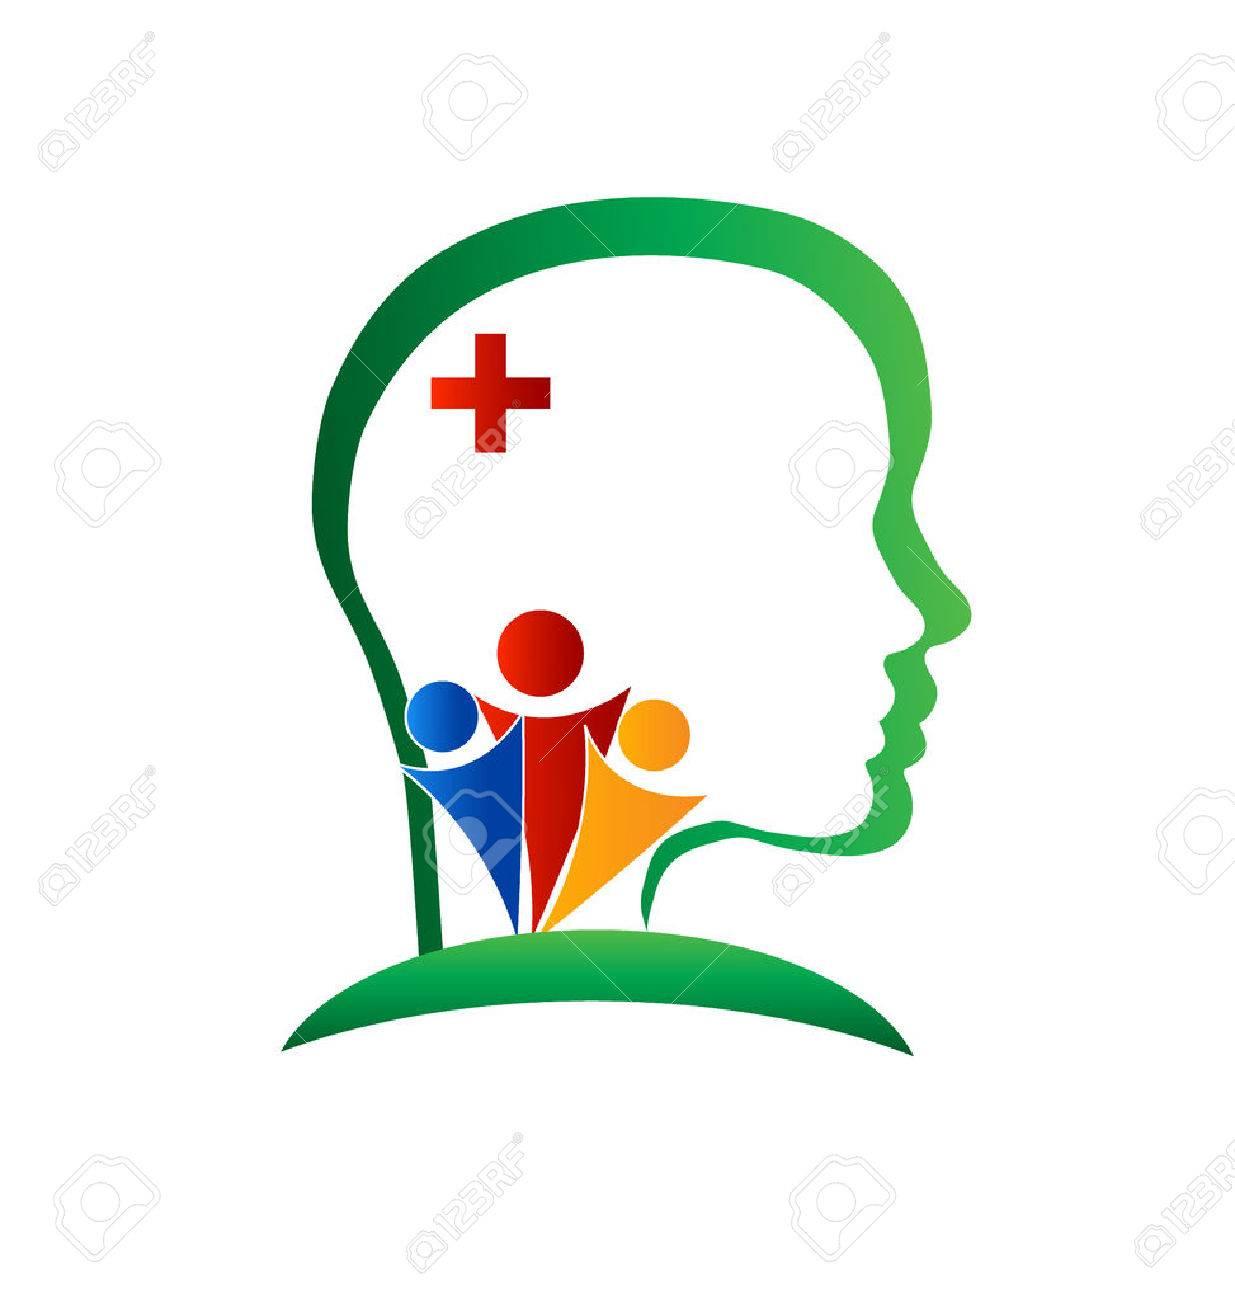 Wellness brain logo vector - 53035447